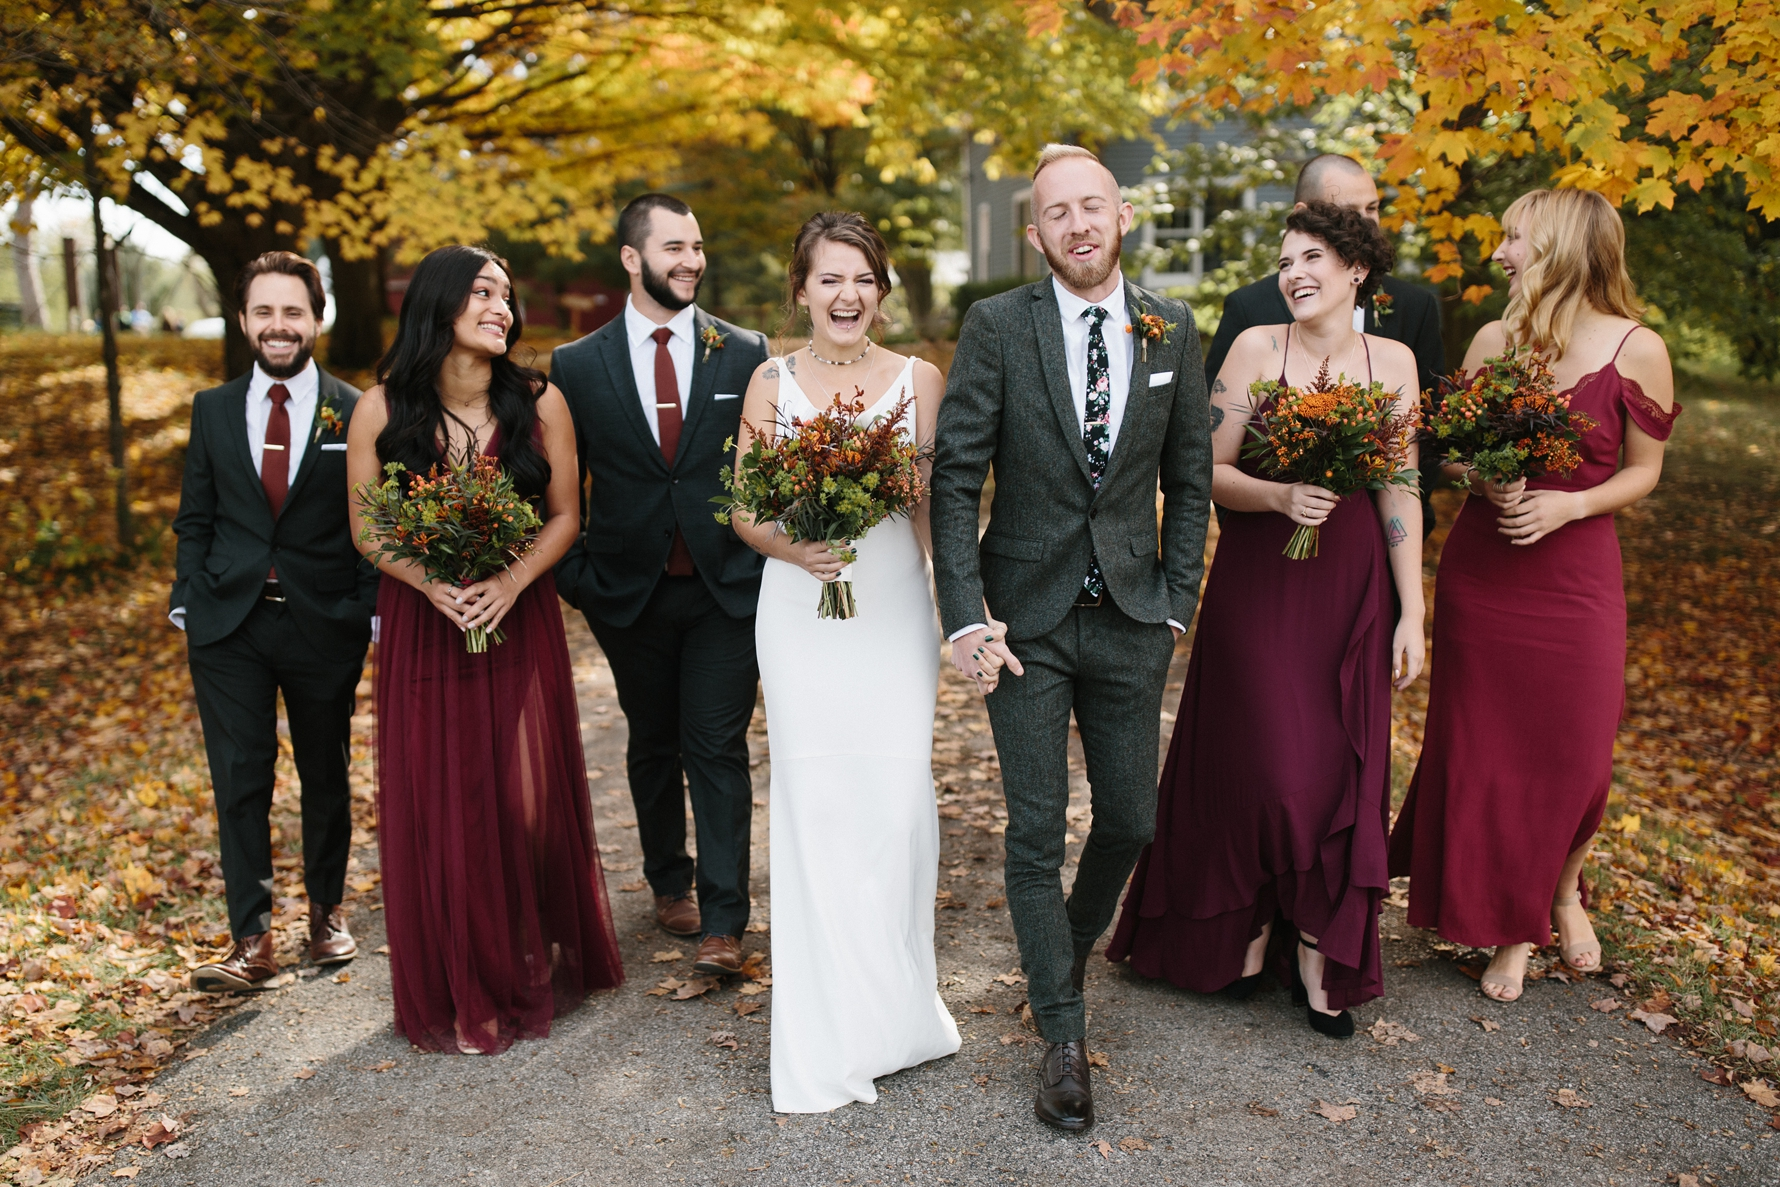 norris-traverse-city-wedding-24.JPG